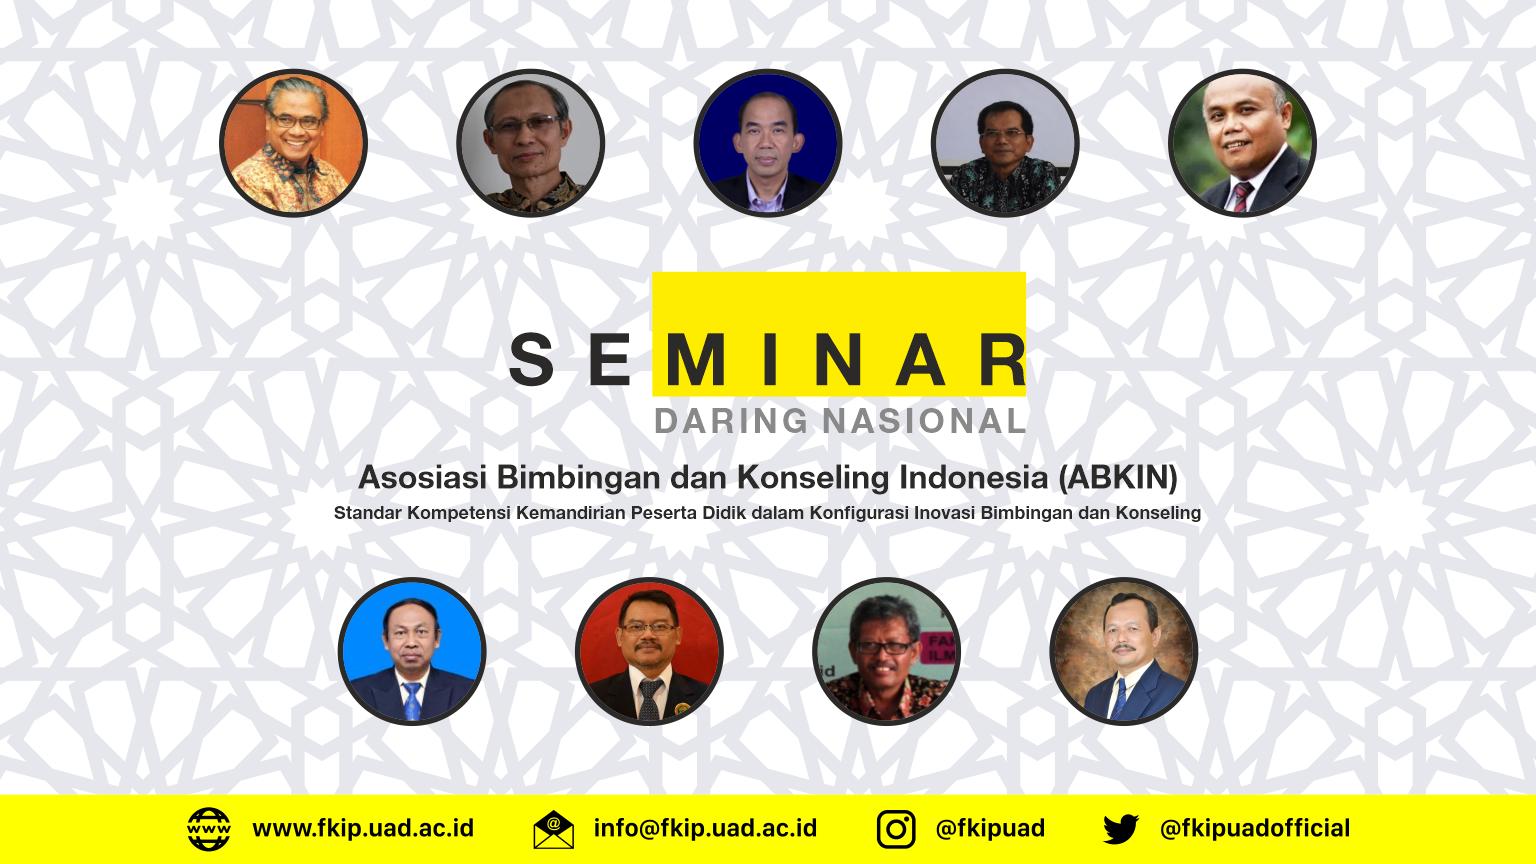 ABKIN Seminar daring Nasional BK 2020